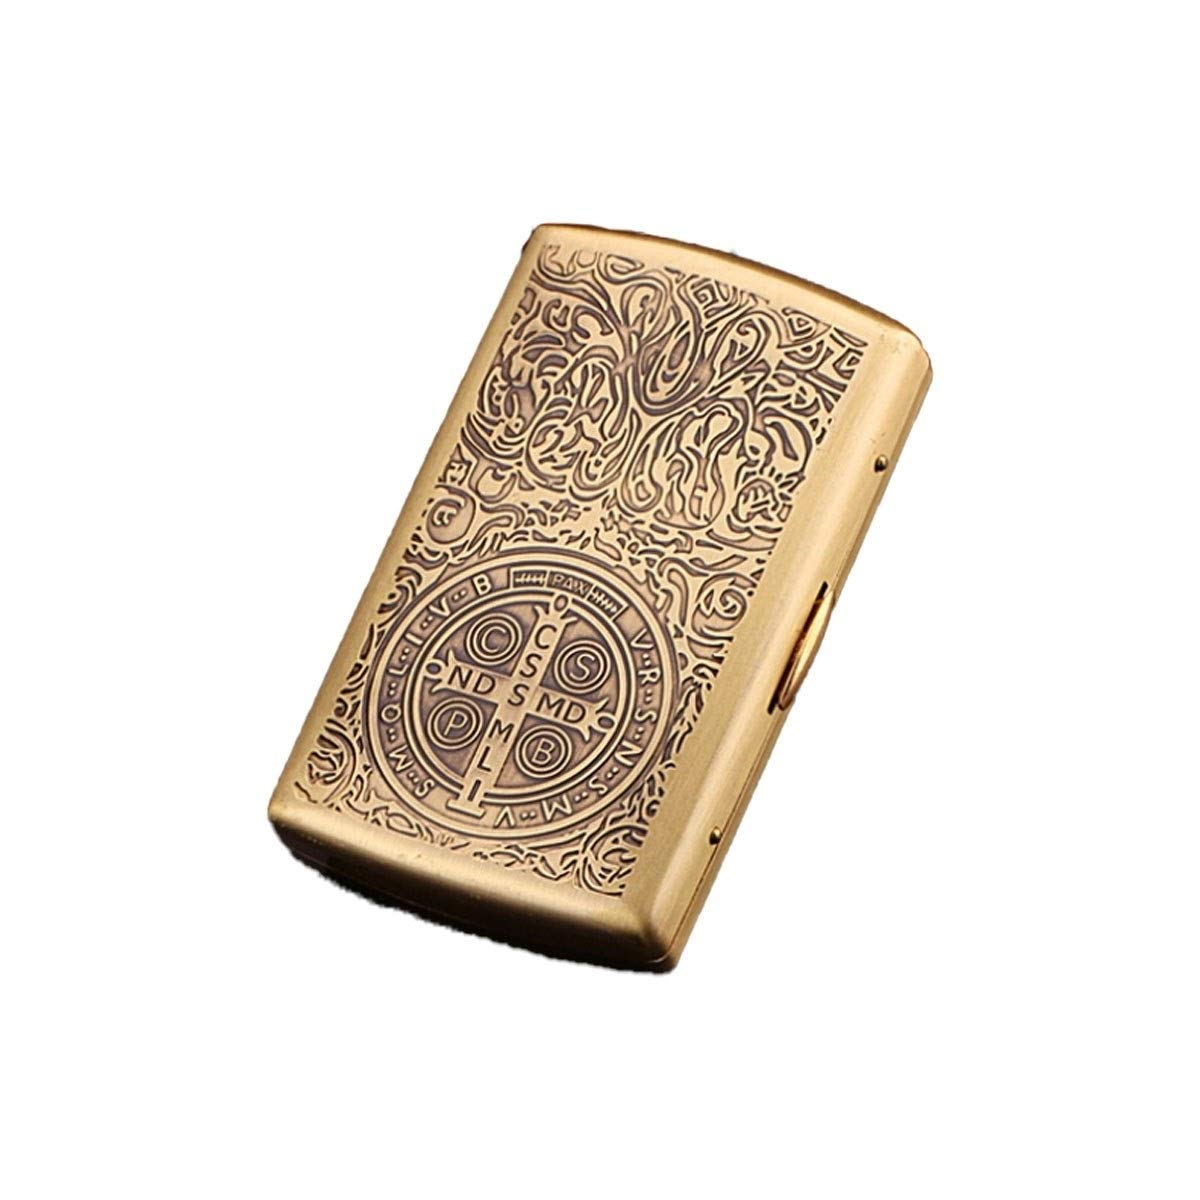 WENPINHUI Pure Copper Cigarette Case 12, 12 Capacity, Metal Cigarette Case, Creative Personality Men's Cigarette Case - The Best Gift (Color : Gold)